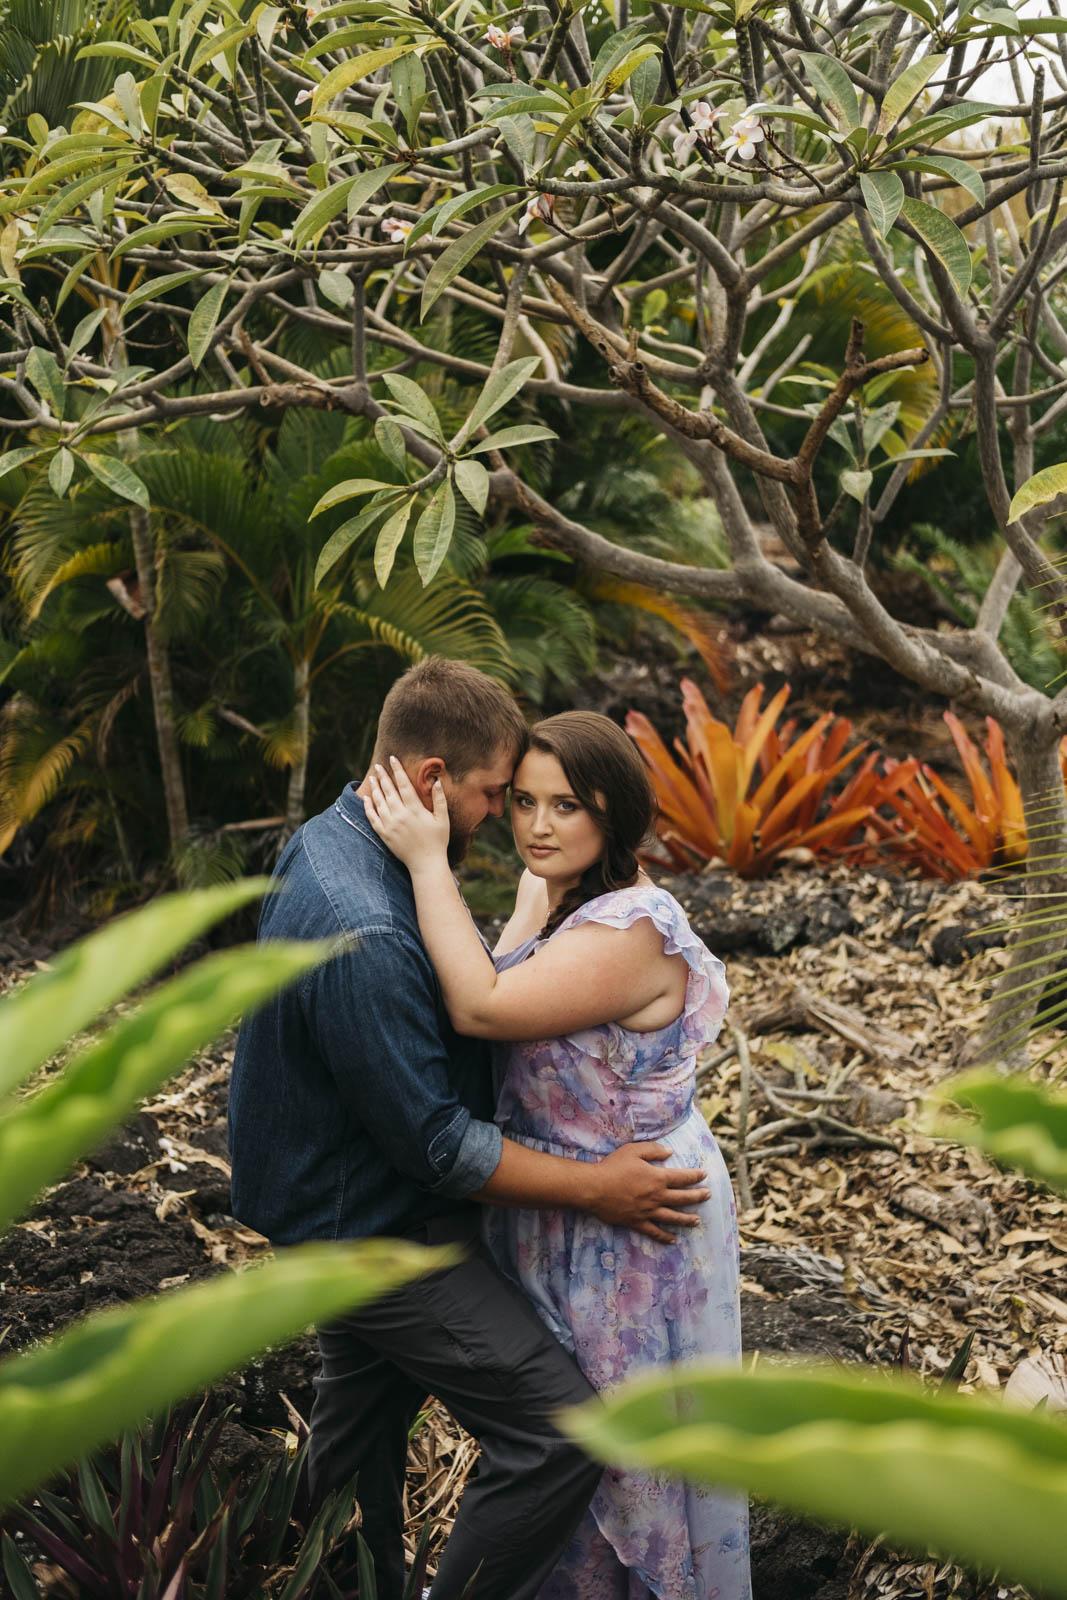 Bride and groom at destination wedding in Hawaii.